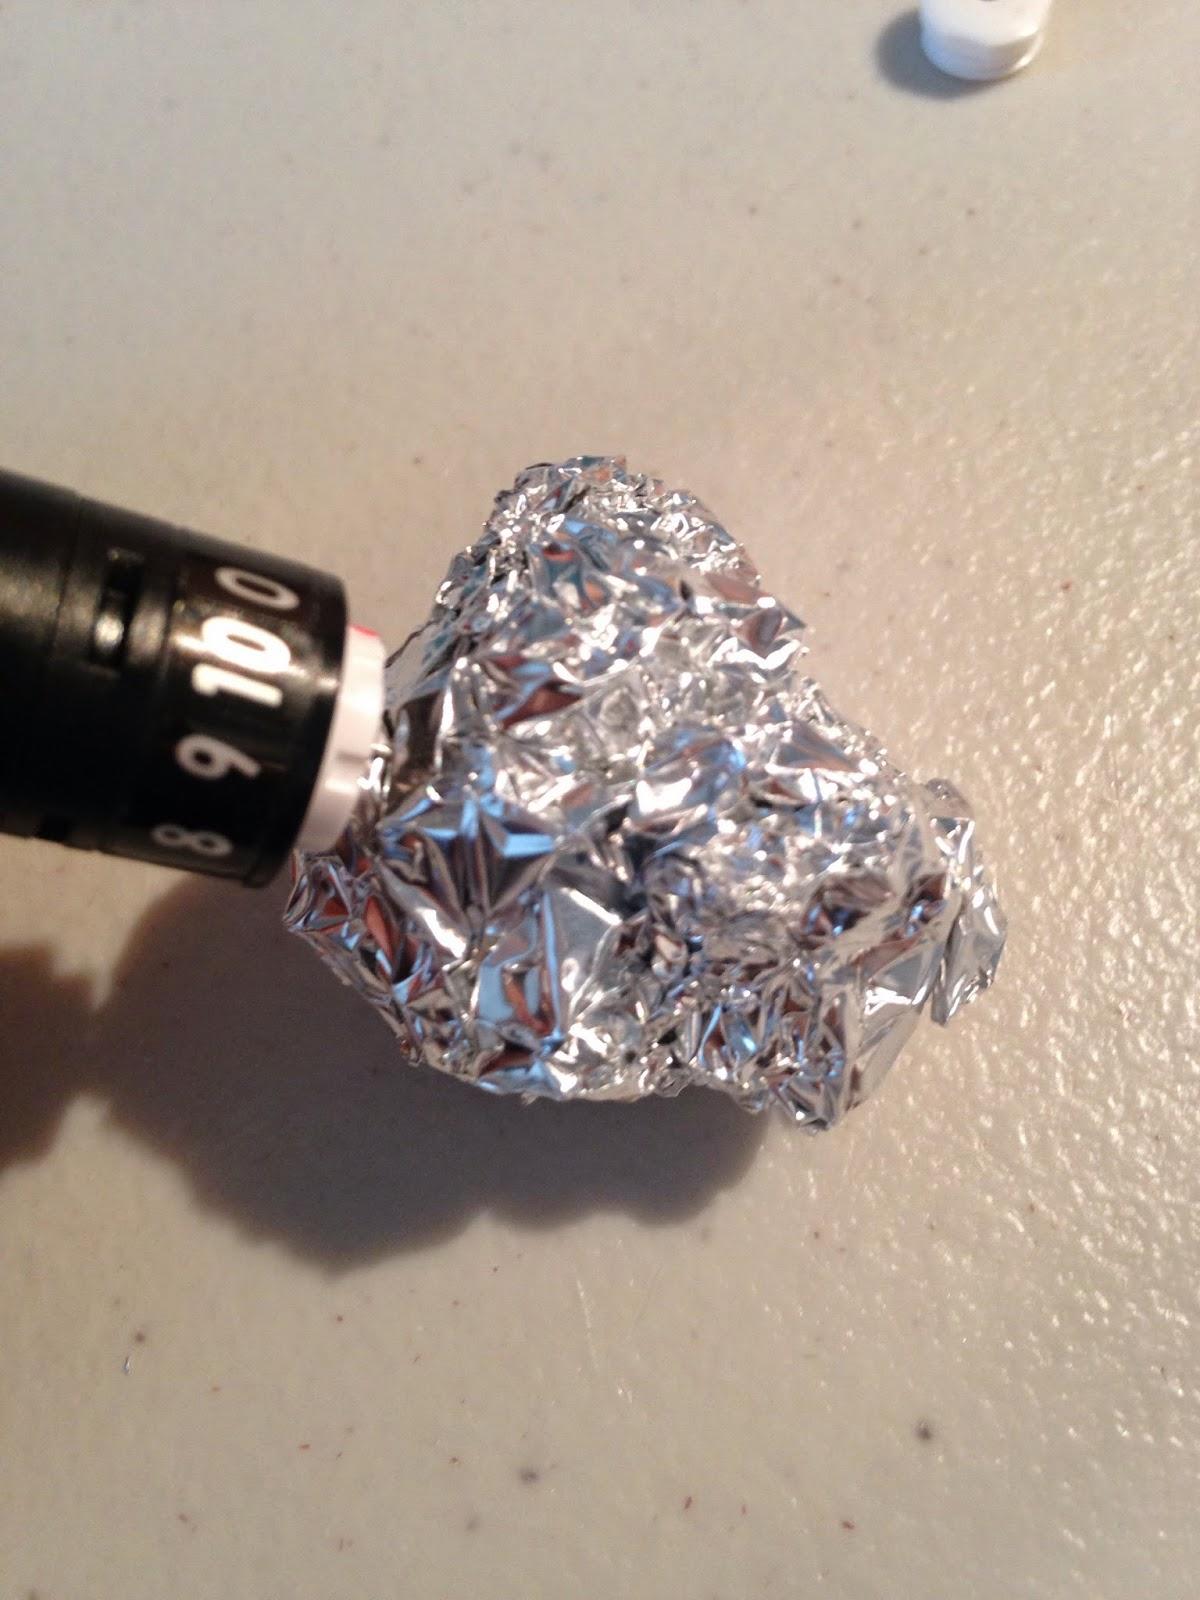 Silhouette blade, sharpening, tin foil, test